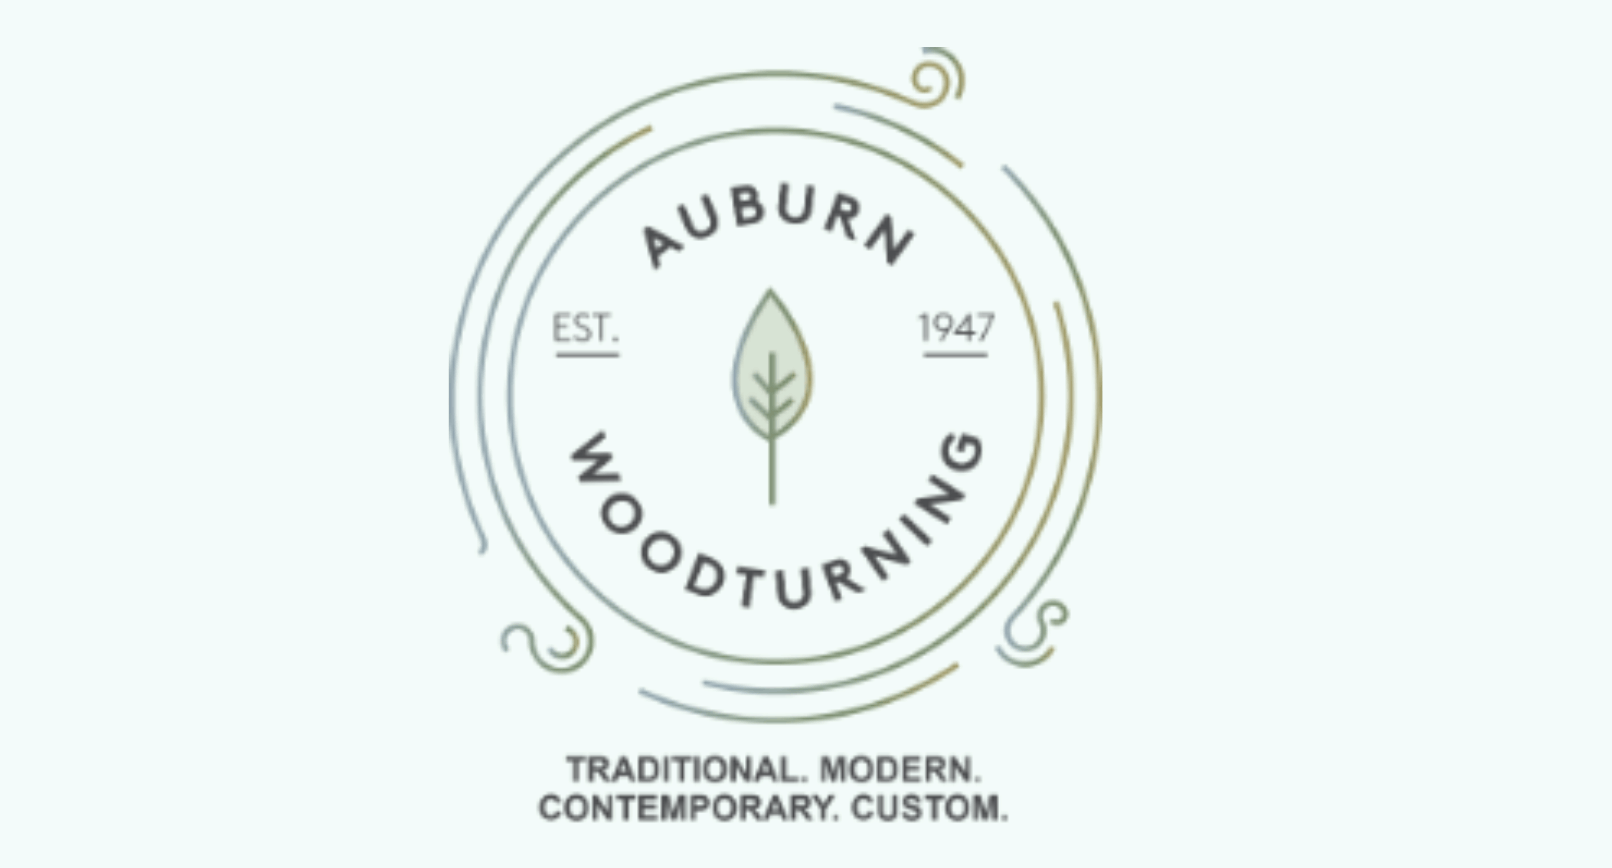 Woodworker logo: Auburn Woodturning